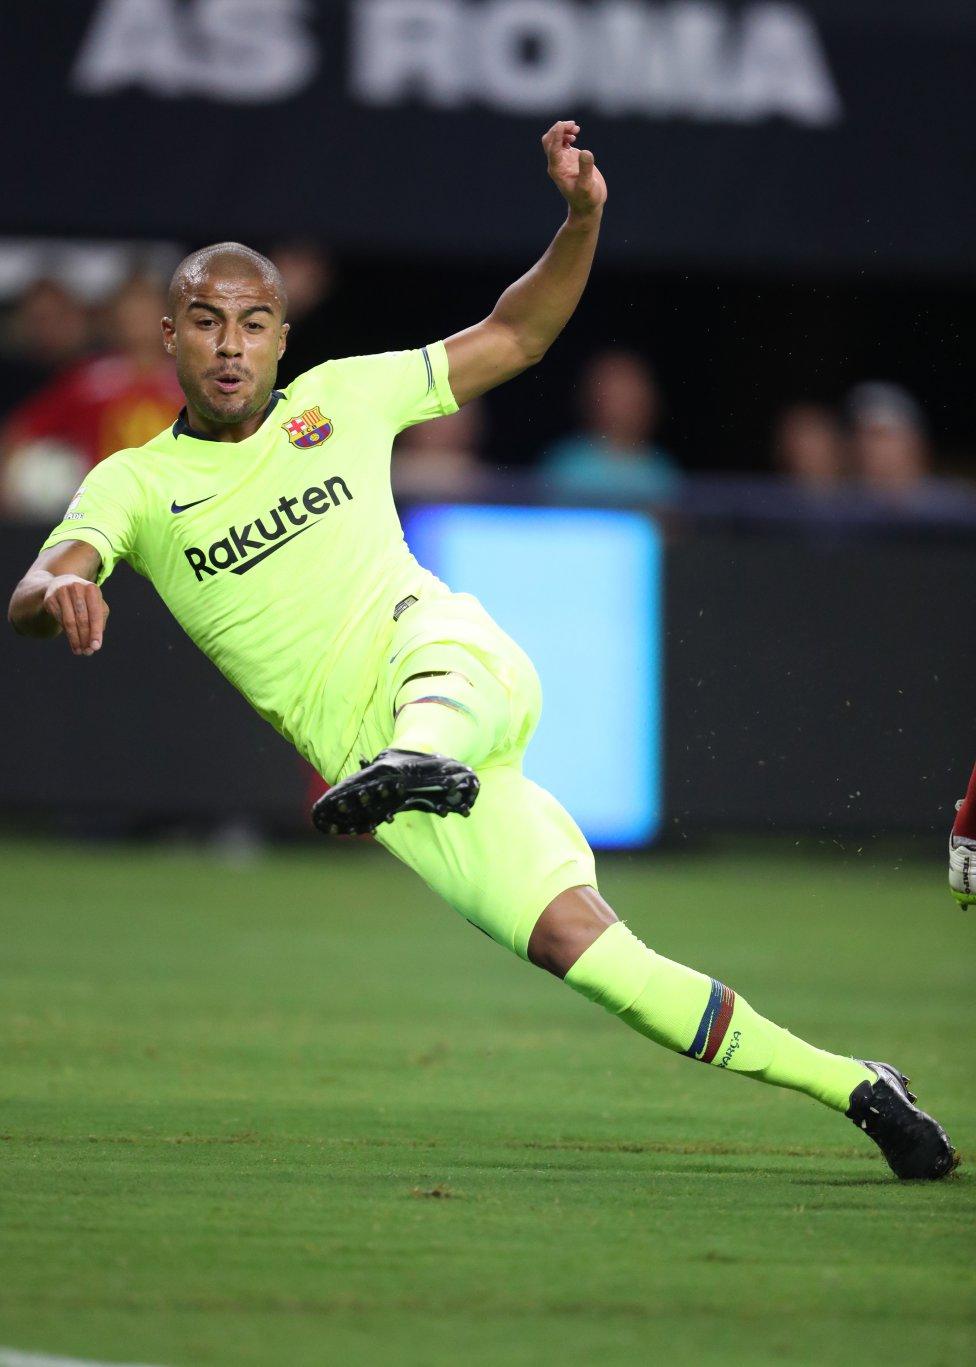 صور مباراة : برشلونة - روما 4-2 ( 01-08-2018 )  1533094115_173347_1533096820_album_grande